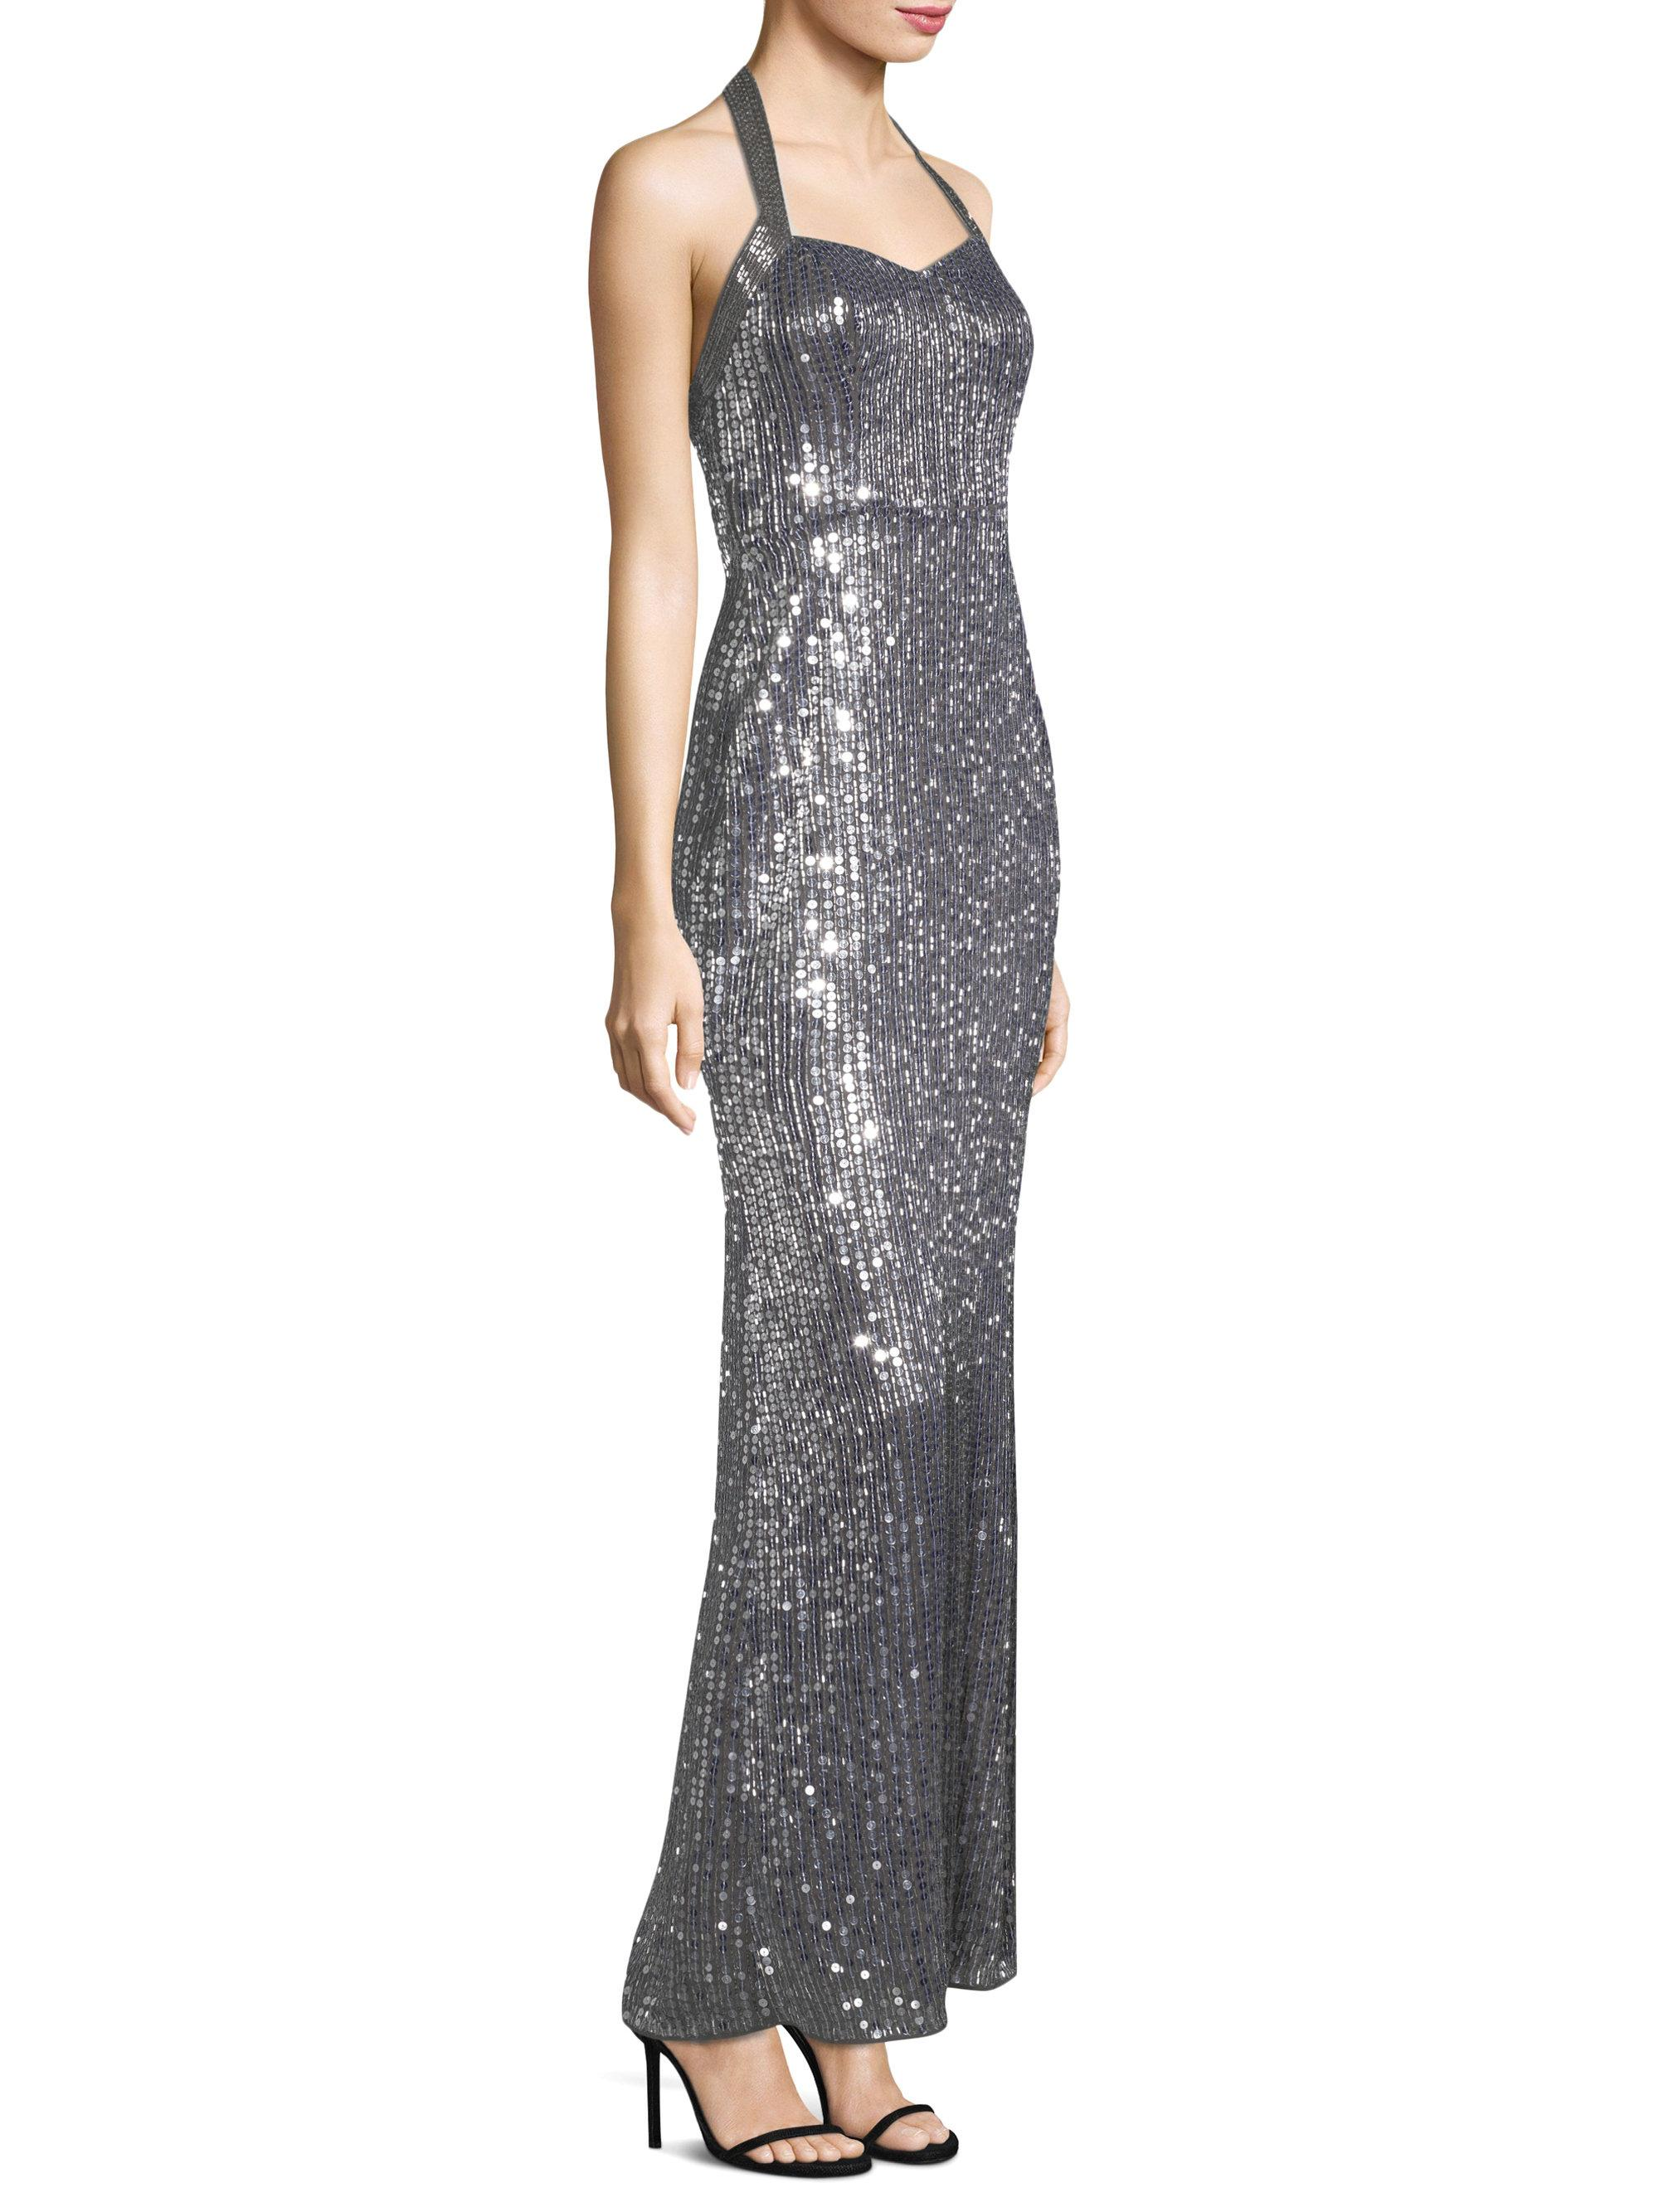 993b2432330 Parker Black Women s Sophie Sequin Gown - Grey - Size 2 in Gray - Lyst